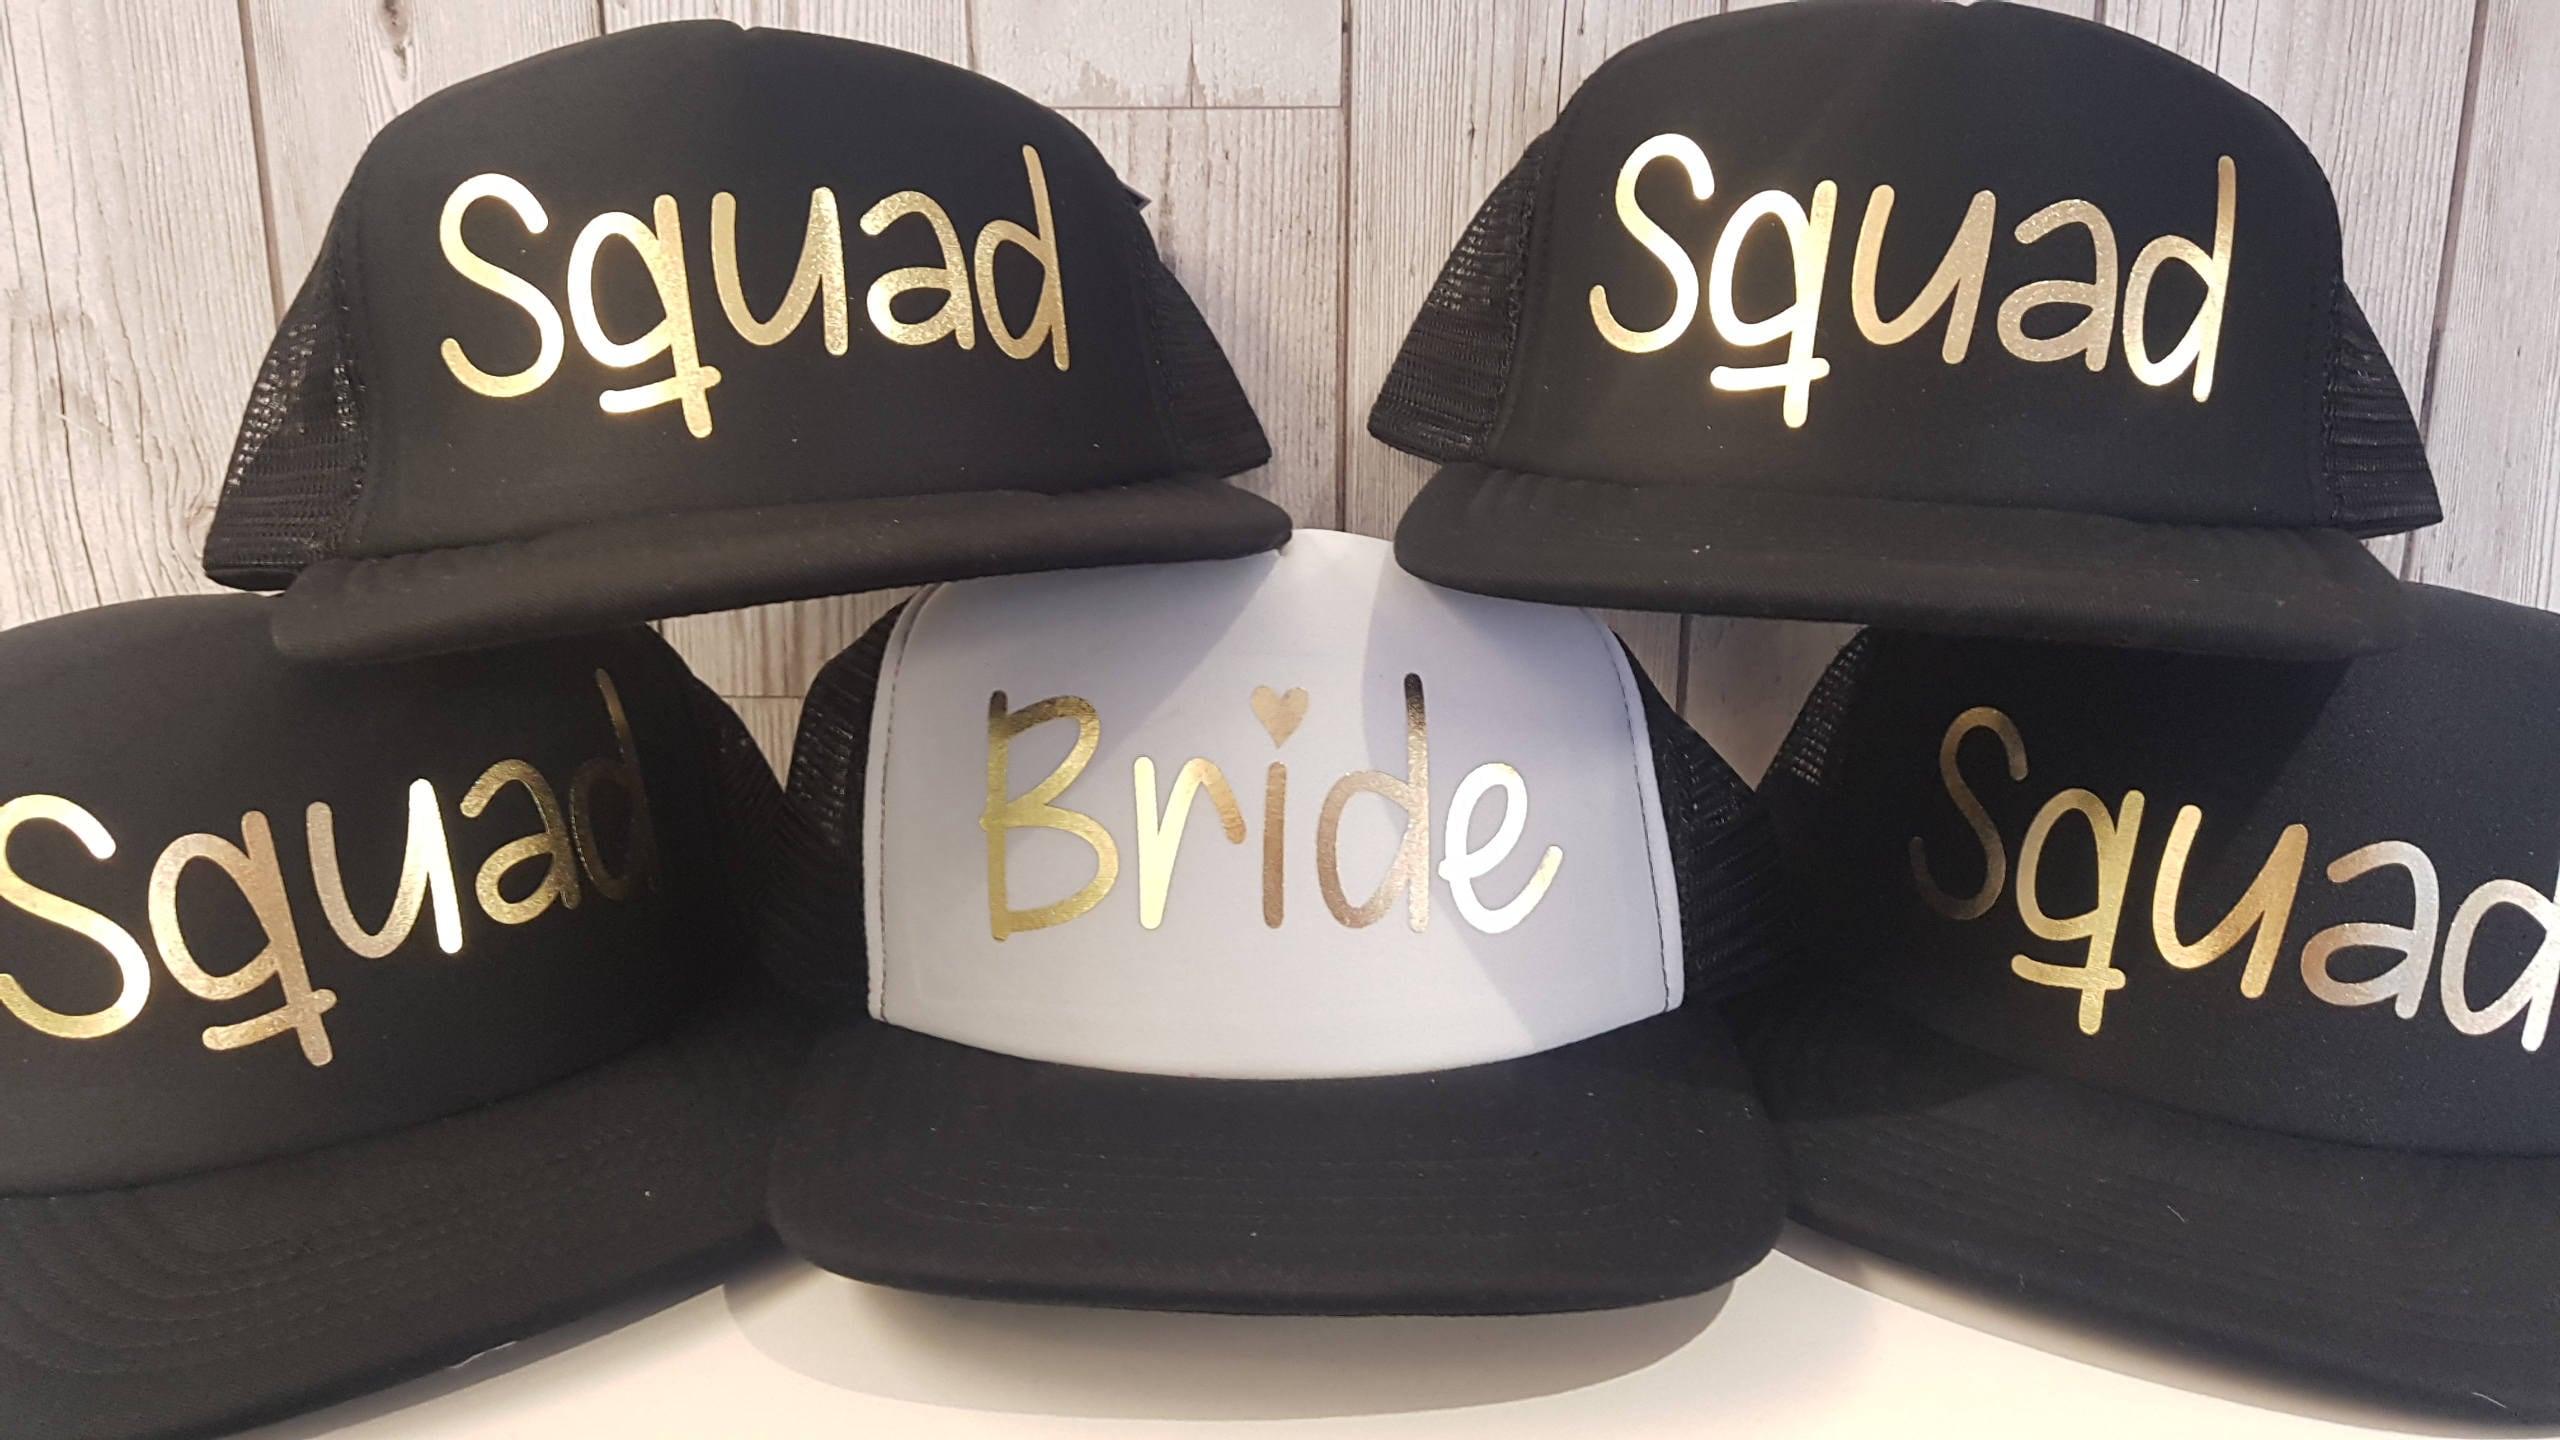 e06255c5dbf BRIDE   SQUAD Hen Party Night Snapback Baseball Caps Hats And Gold Foil  Print